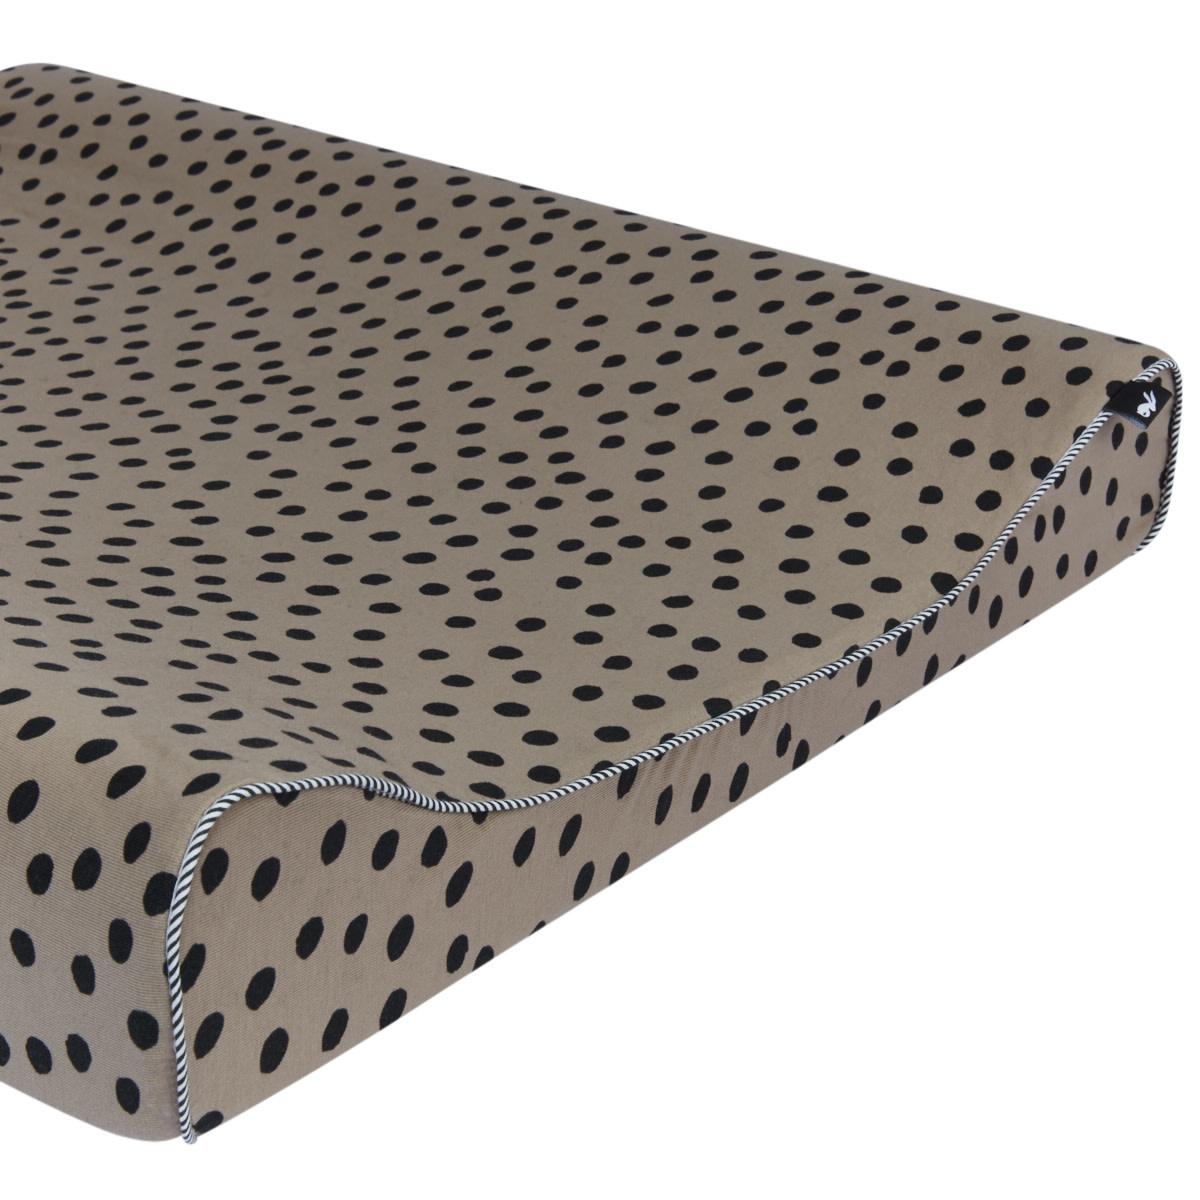 Mies & co aankleedkussenhoes bold dots dark brown-1